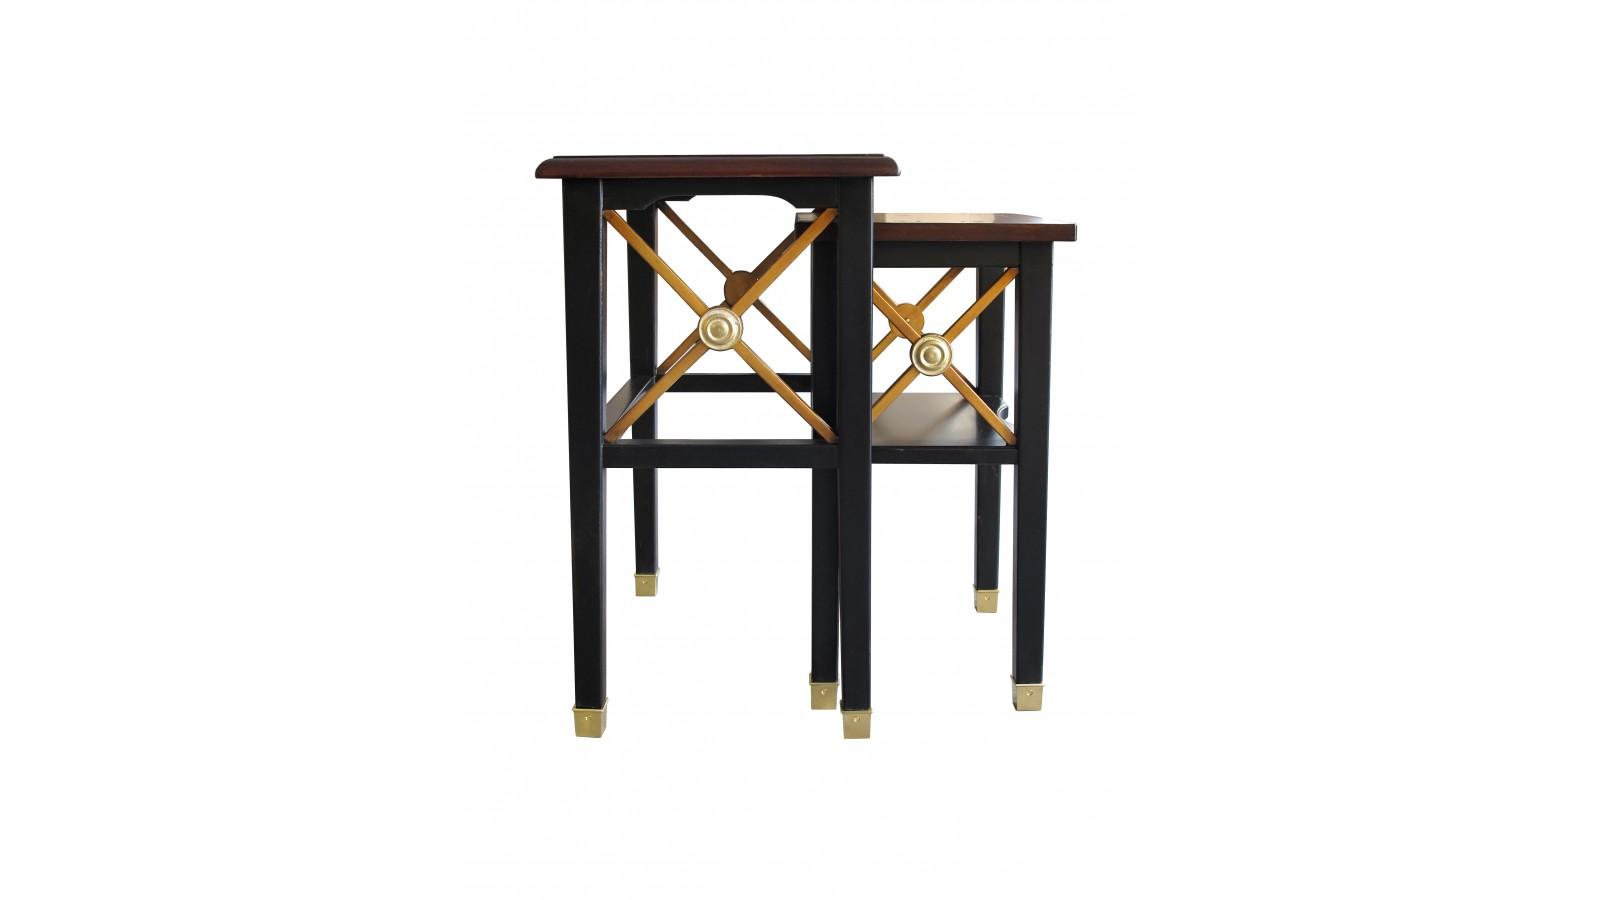 ... Chicago Nest Of 2 Tables M838 MONTIGNY M838_c_black_10_gold_detail_13m1021 5_4_  ...